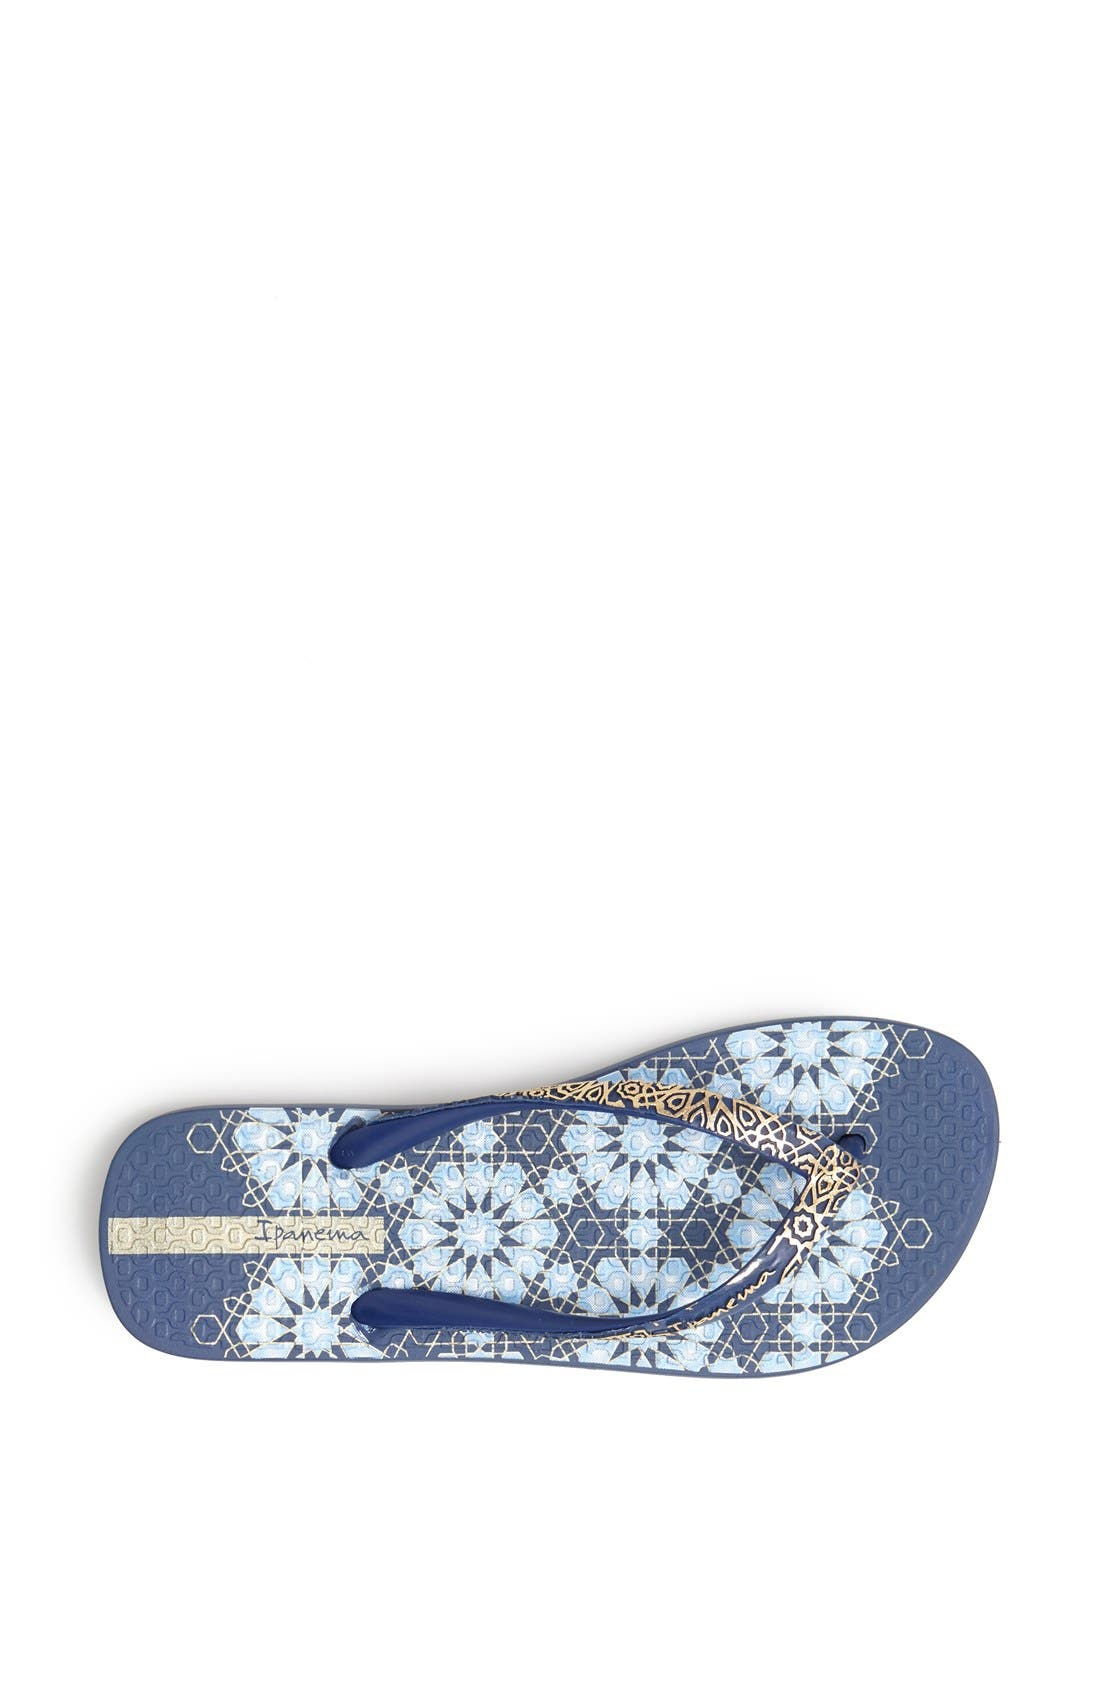 Alternate Image 3  - Ipanema 'Mandala' Flip Flop